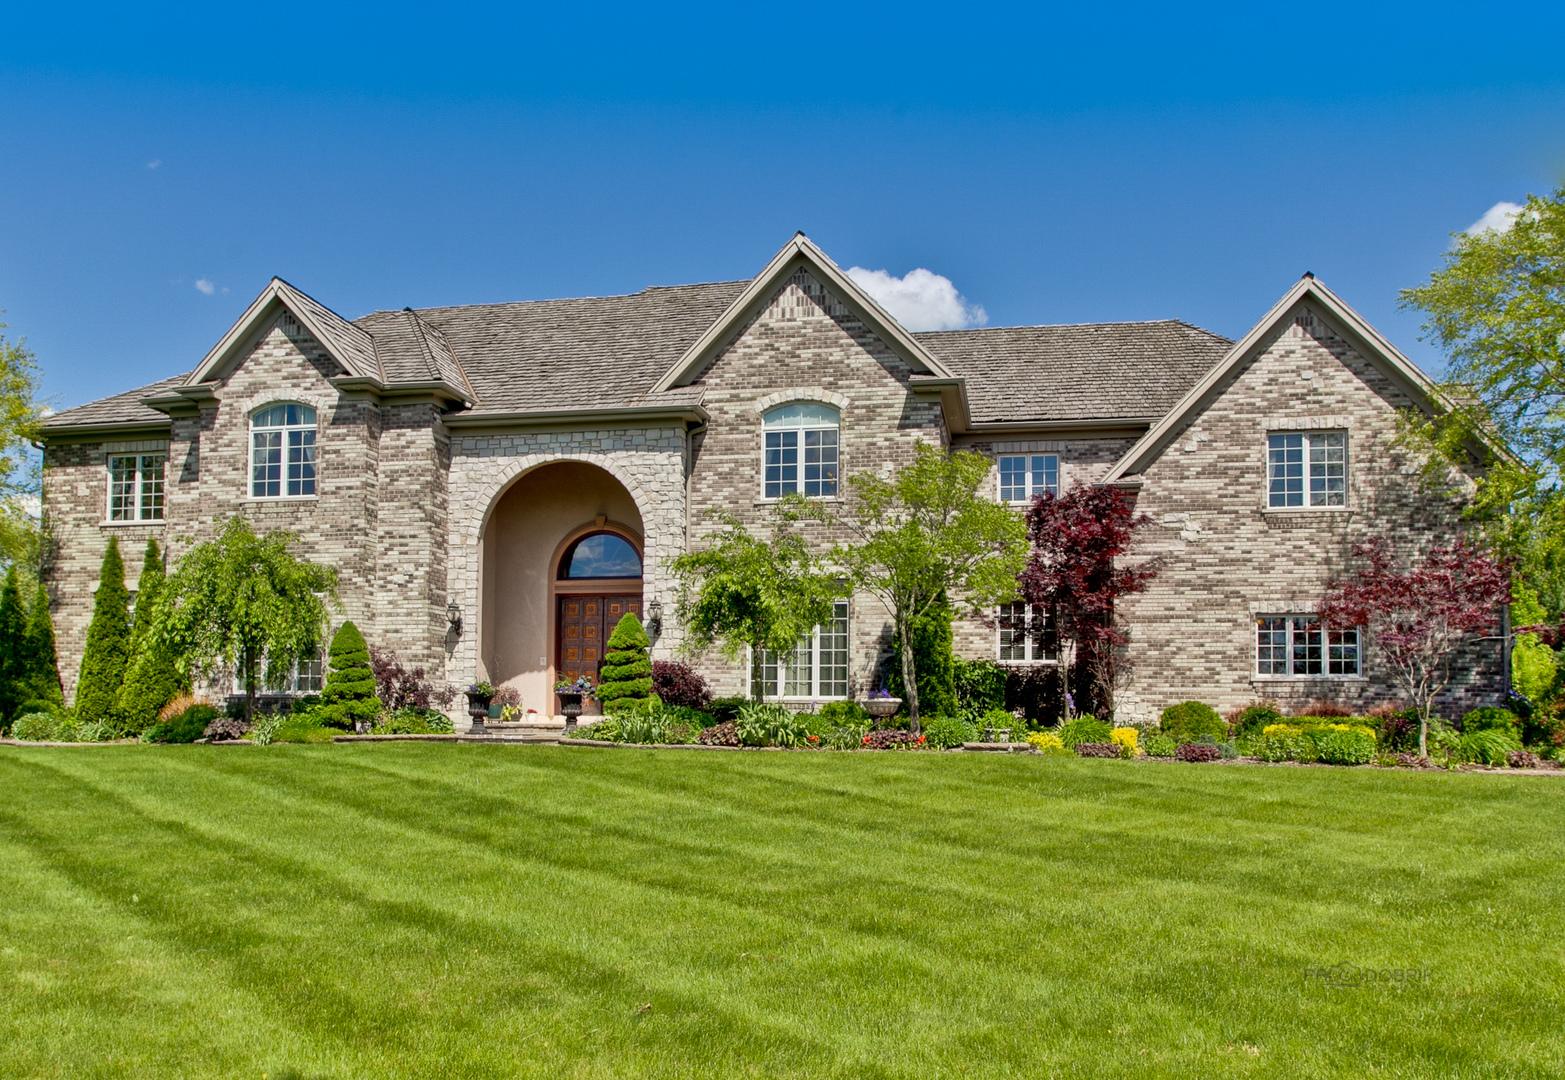 6870 Ellis Drive, Long Grove, Illinois 60047